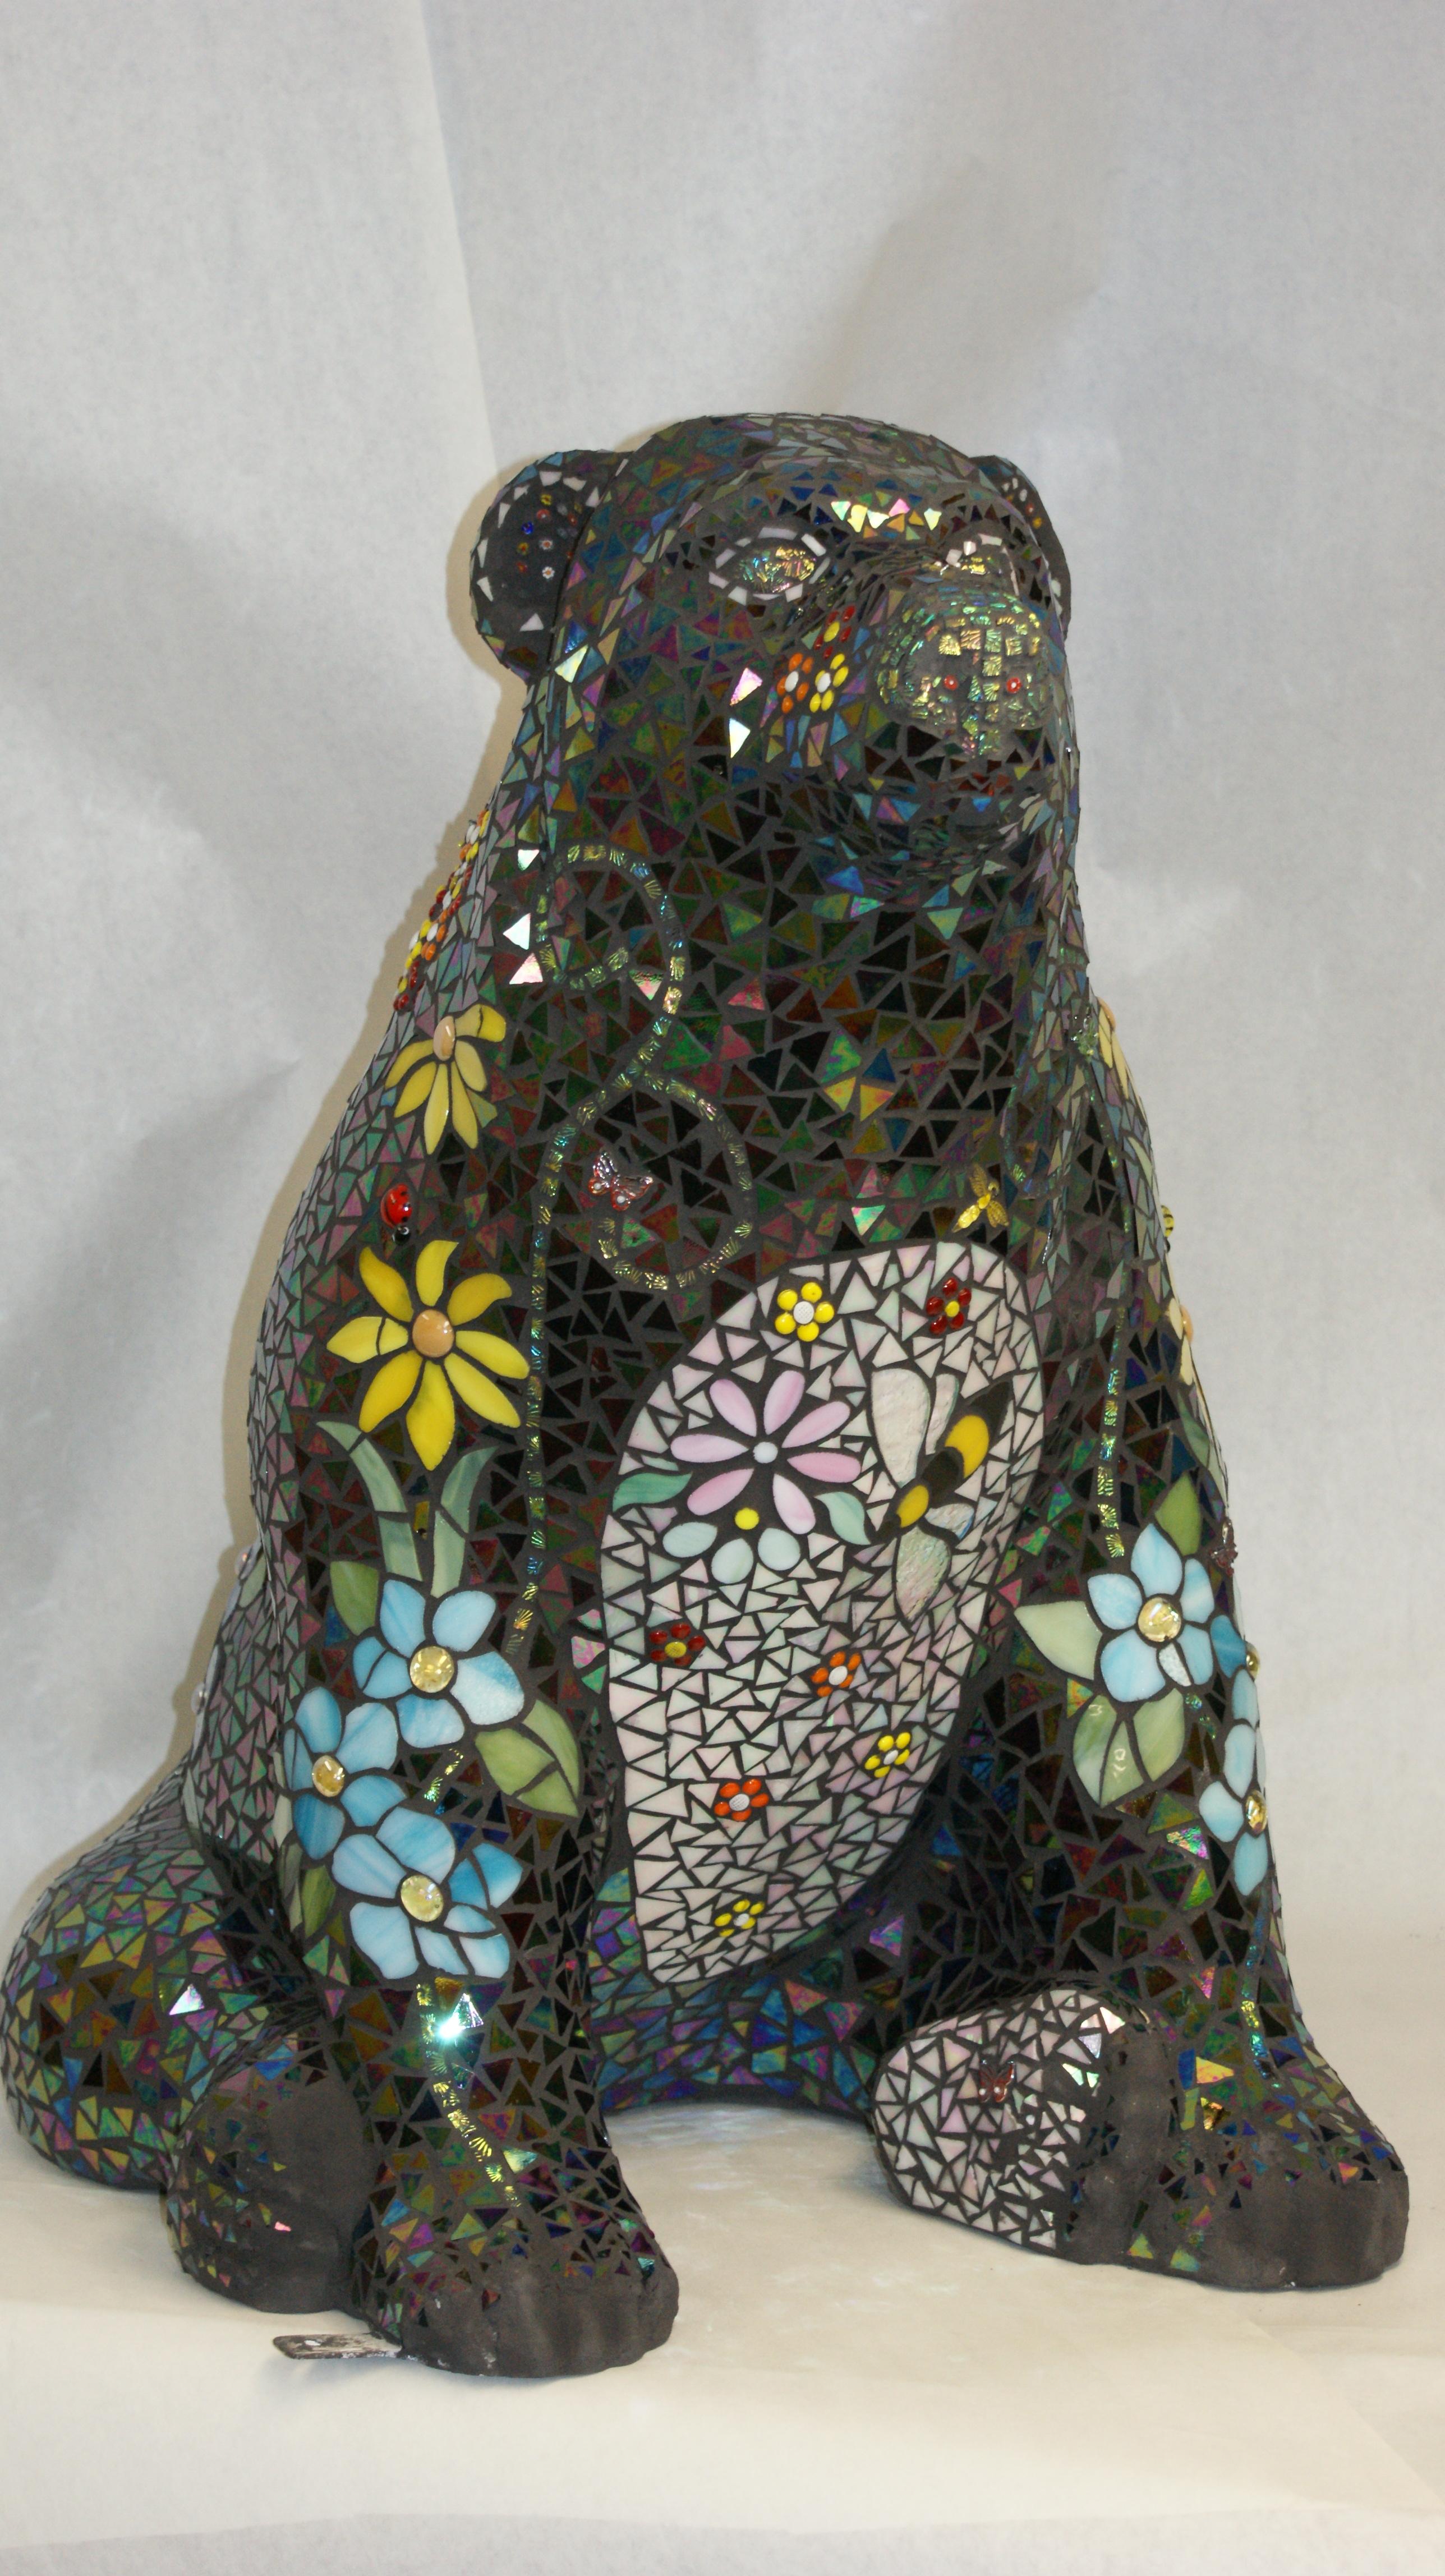 Glass Haus Green Bay : Tom monica pecor the glass haus studio e new art